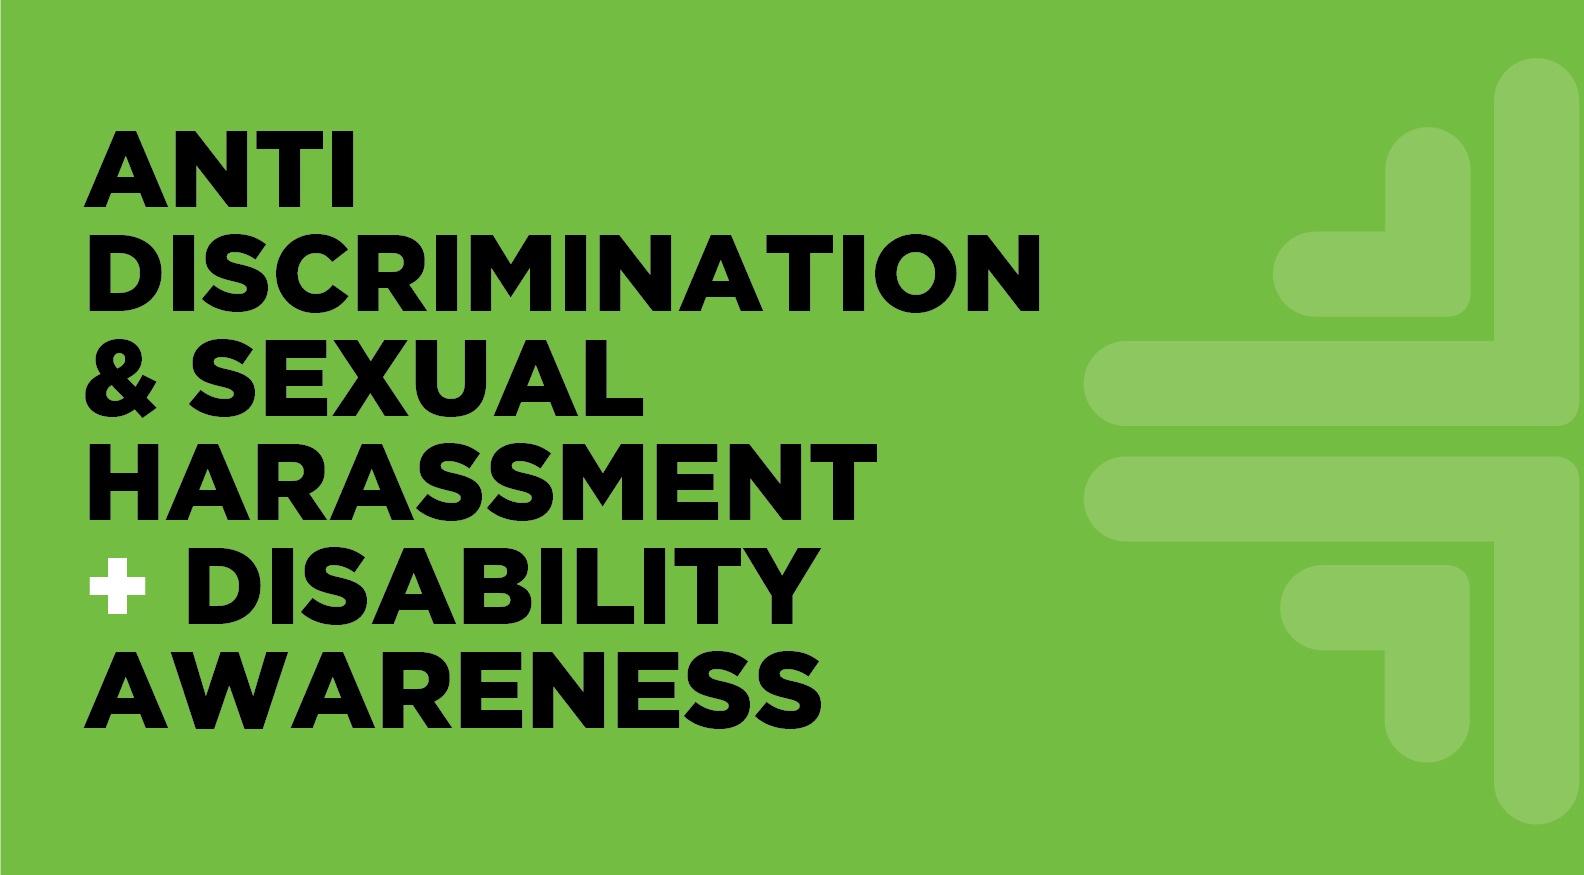 QLD - Anti-Discrimination & Sexual Harassment + Disability Awareness BUNDLE (incl. GST)